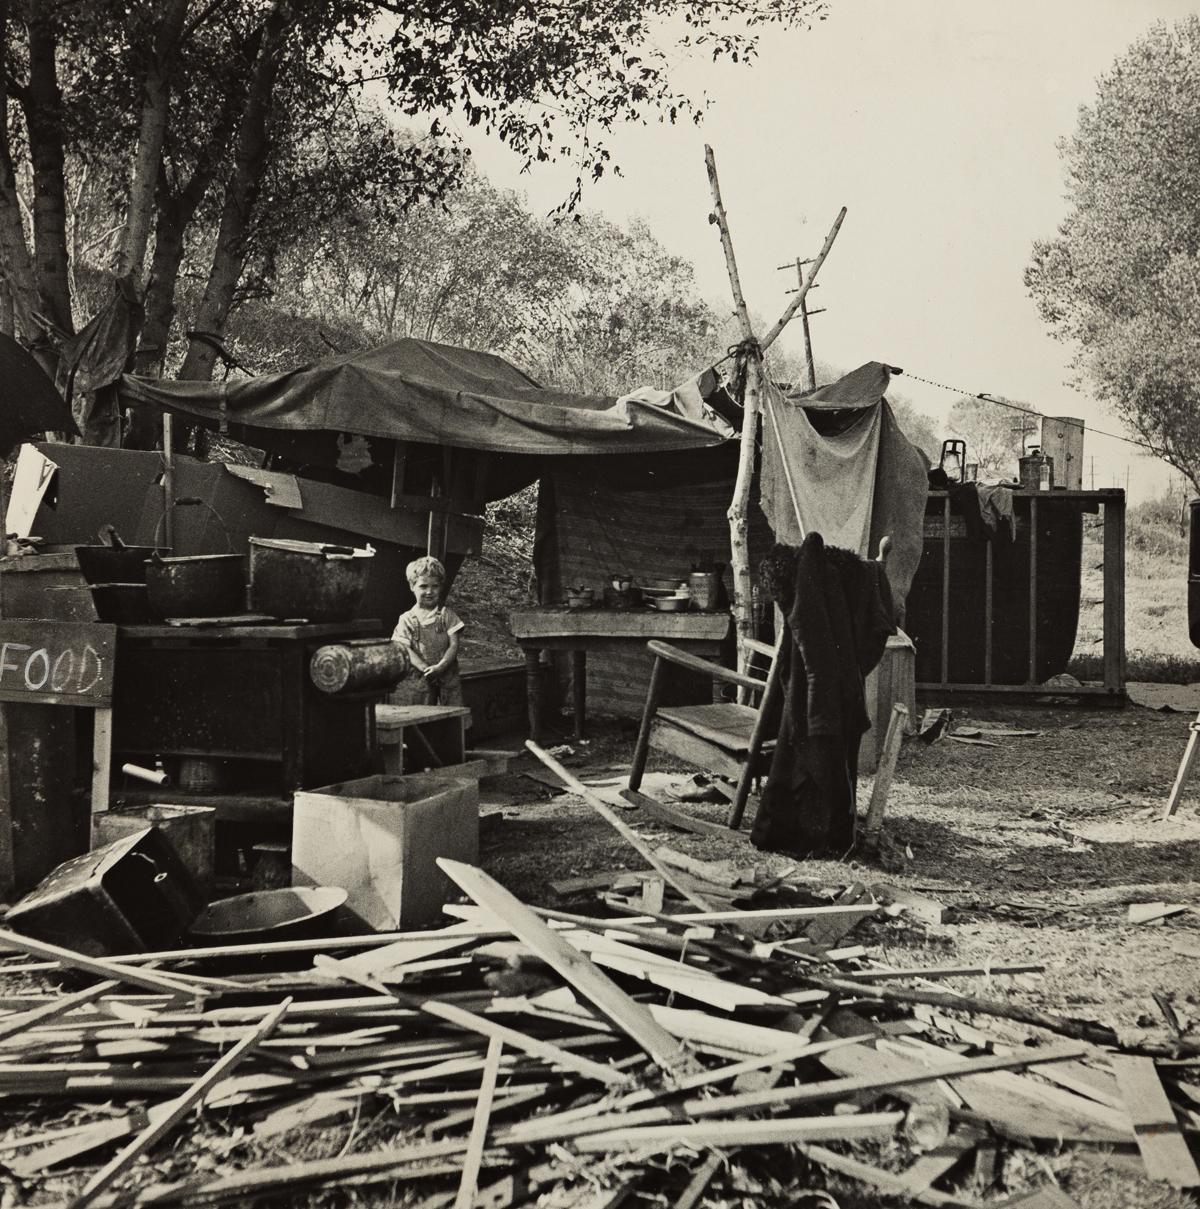 DOROTHEA LANGE (1895-1965) Destitute Family, American River Camp, Sacramento, California.